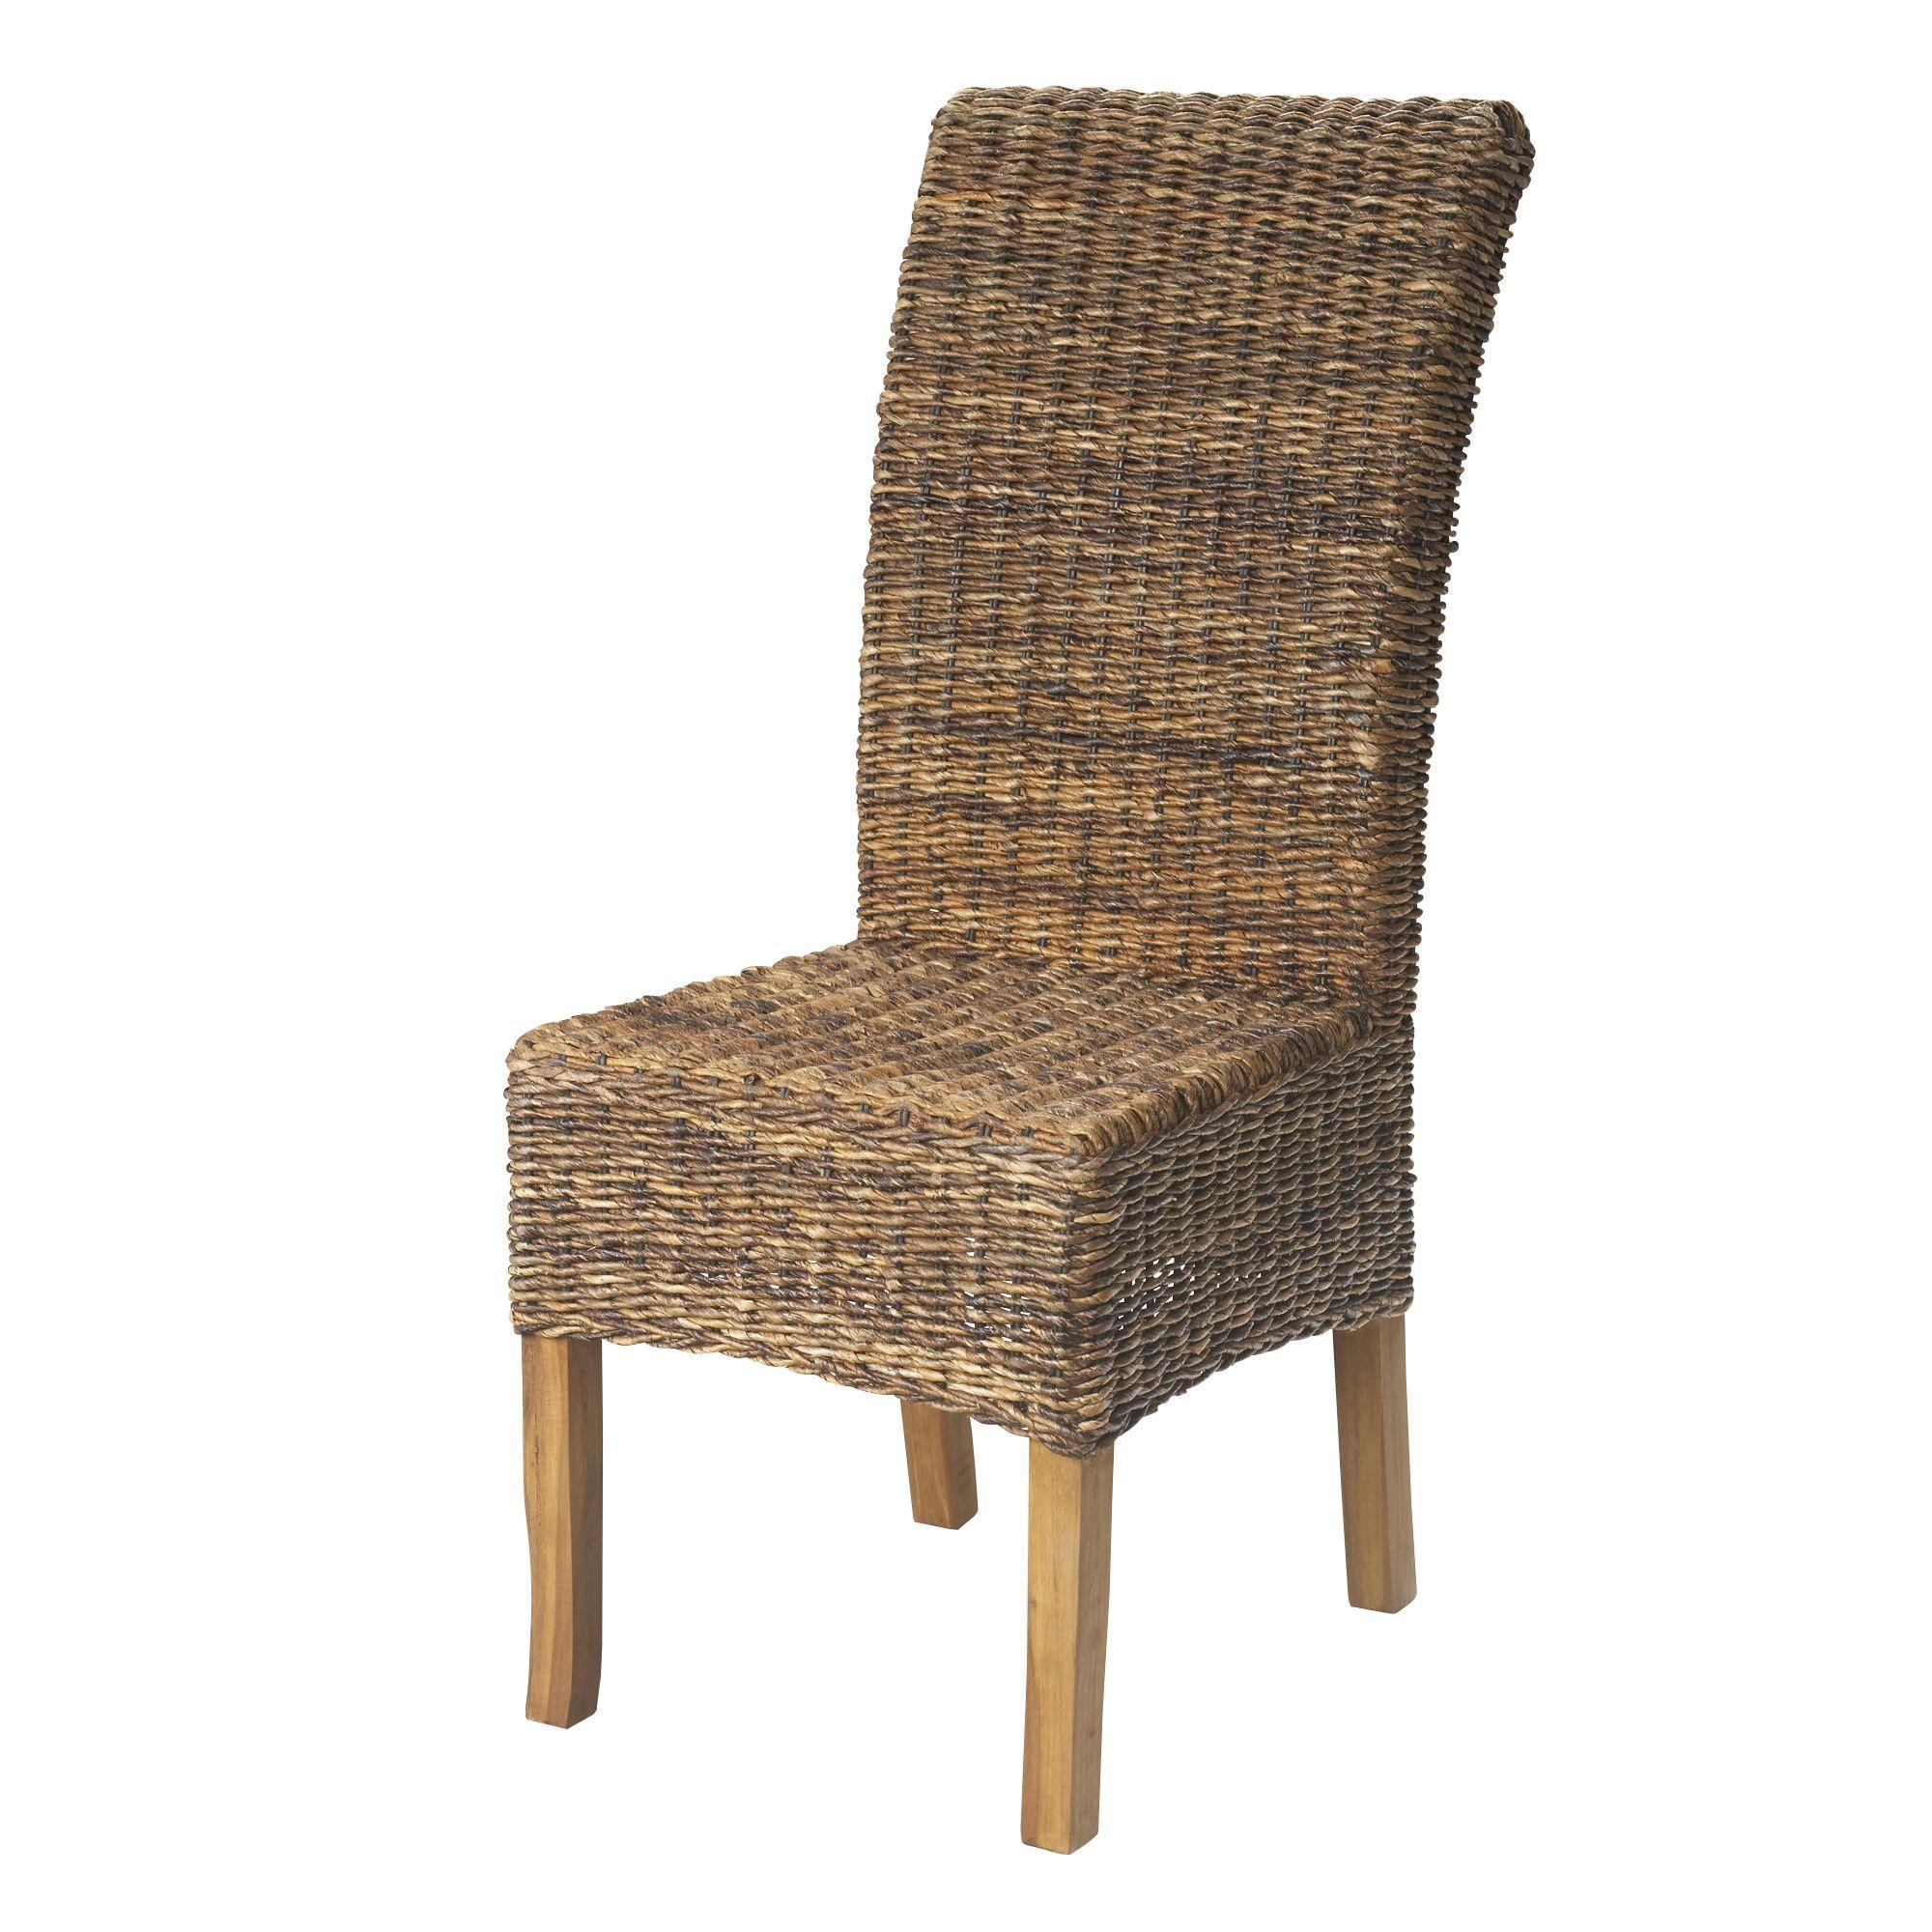 Chaise en abaca naturel naturel samourai chaises - Alinea chaise salle a manger ...